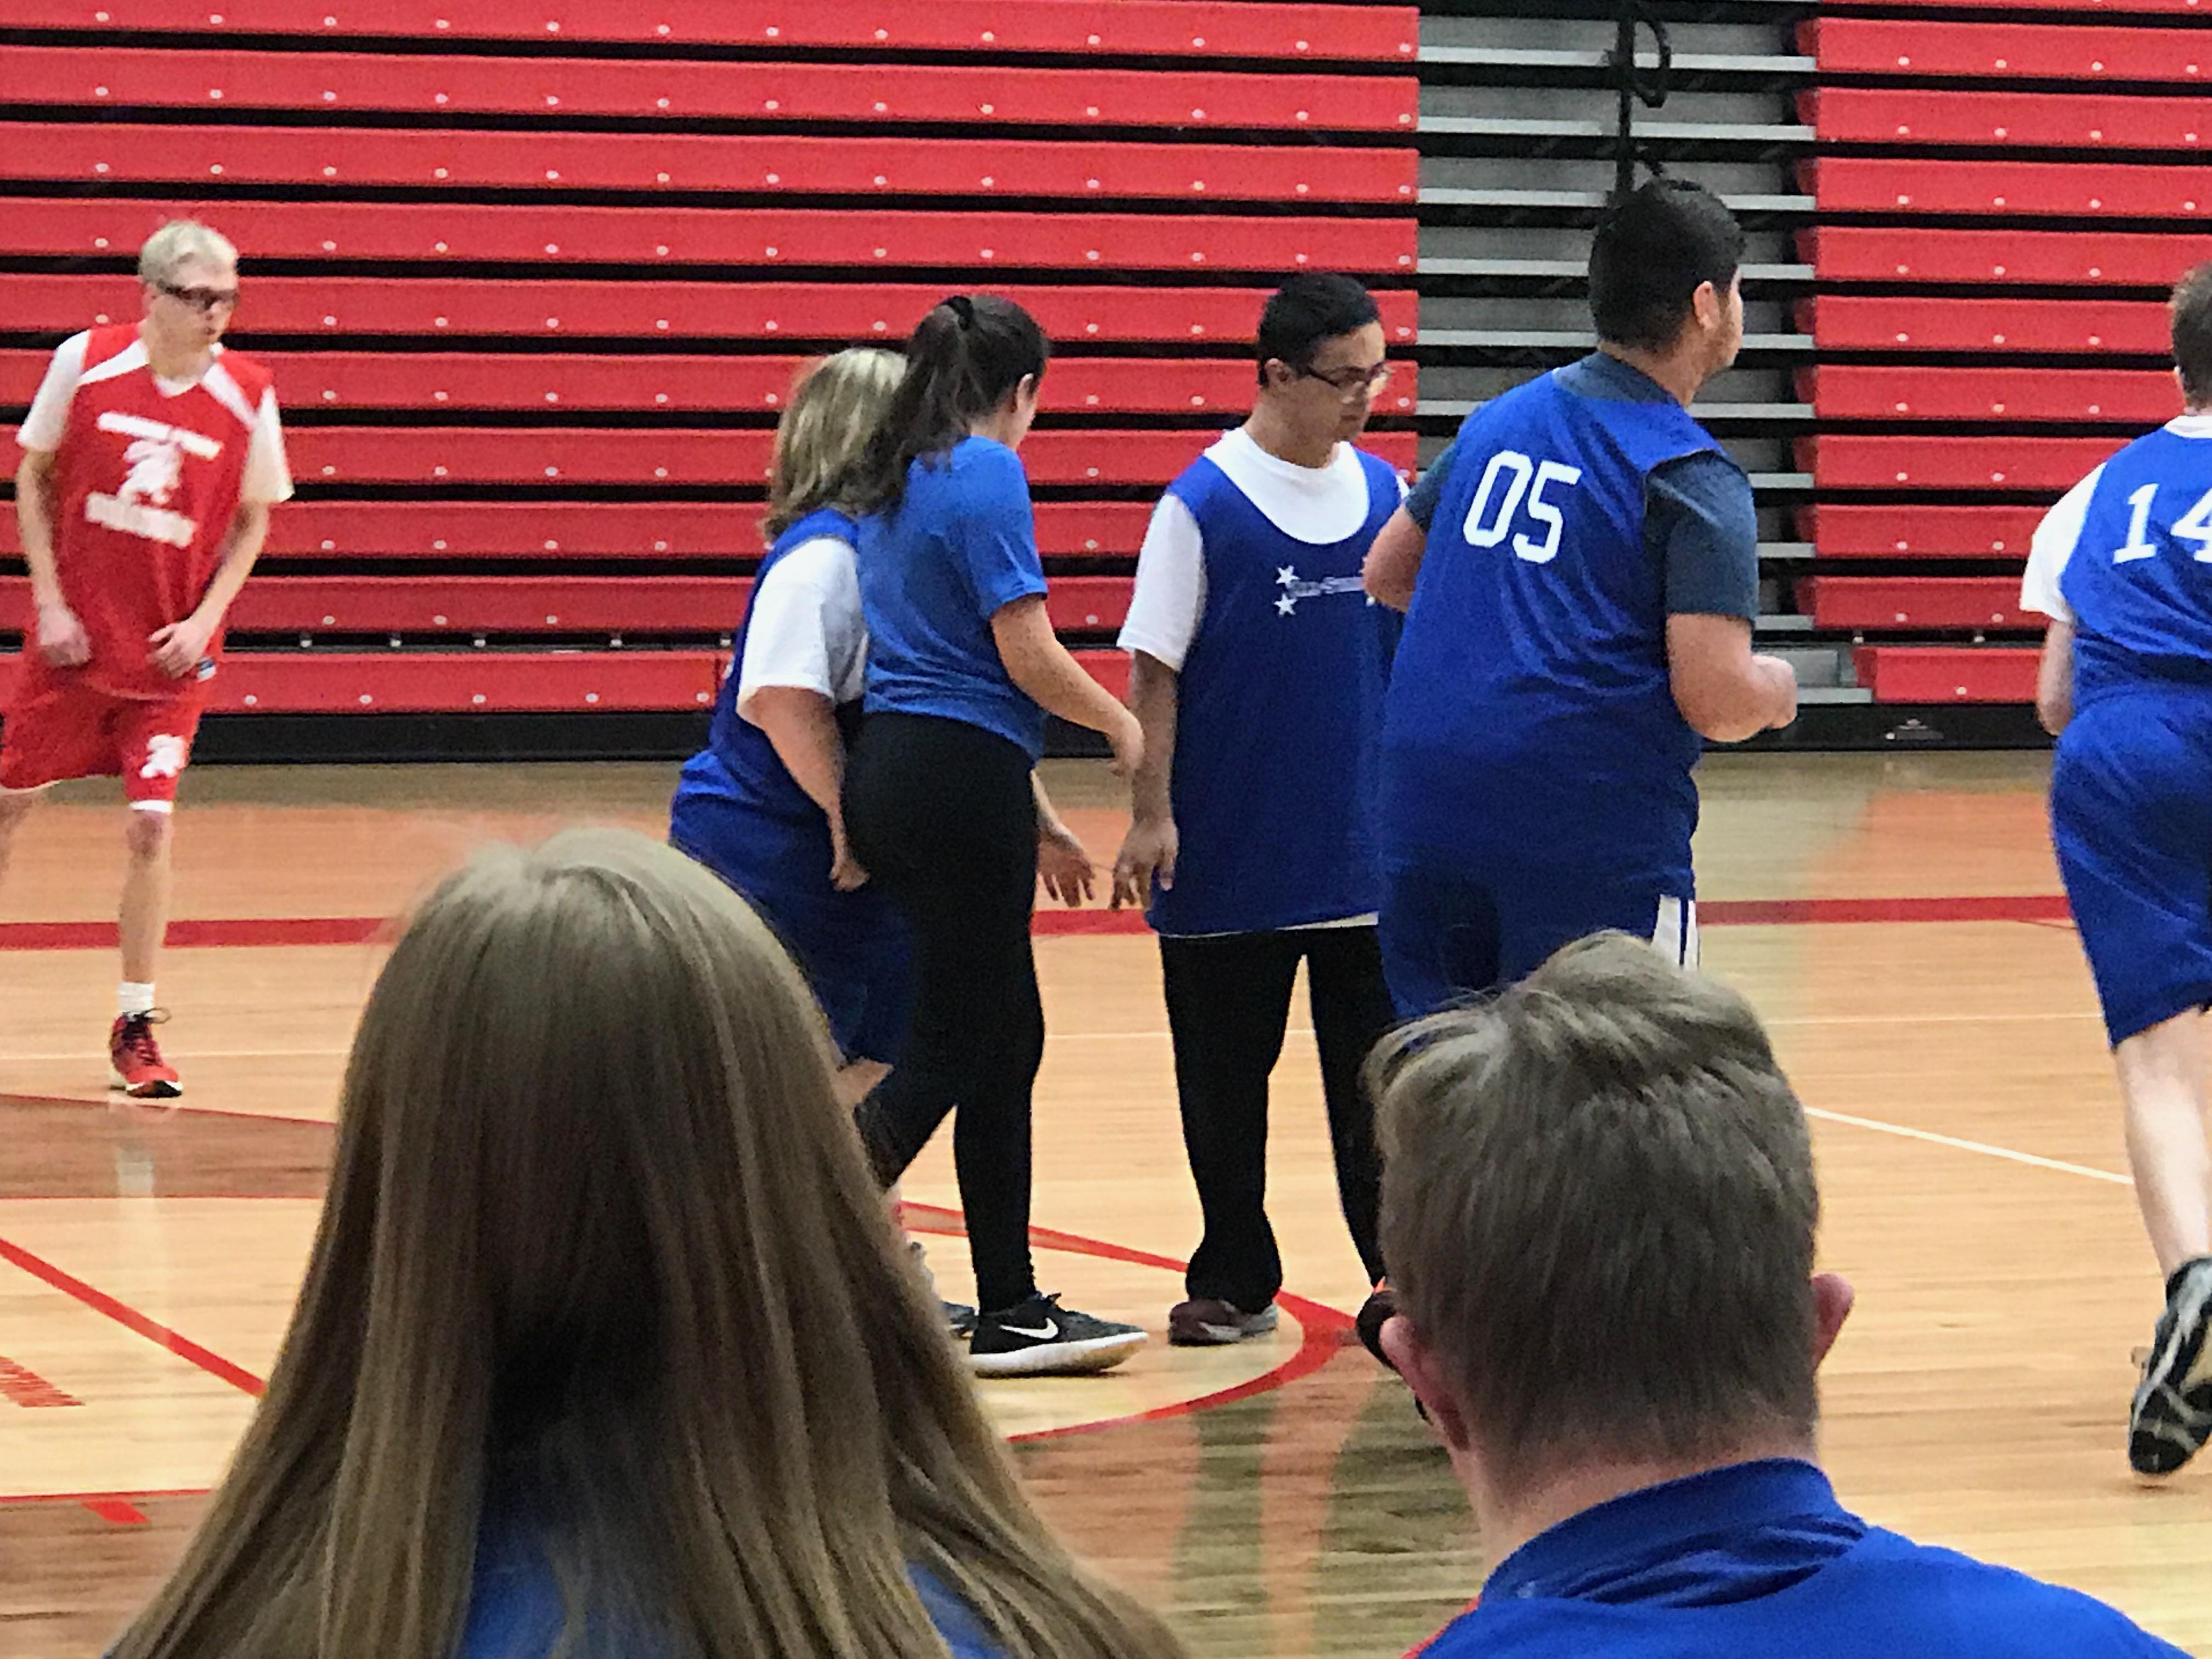 Coach Powers' blue team plays at CPHS